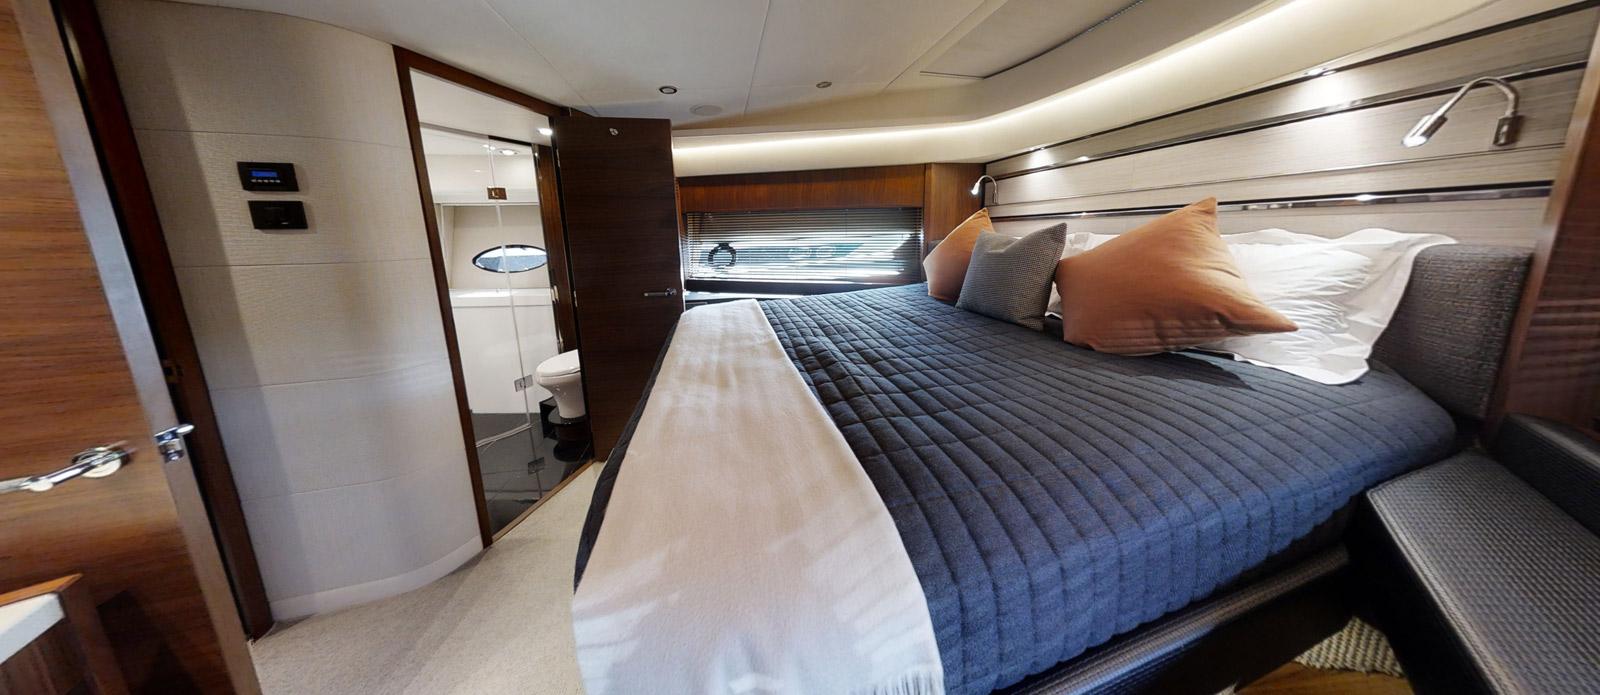 Princess-S72-Gee-n-Tee-VIP-Cabin-2